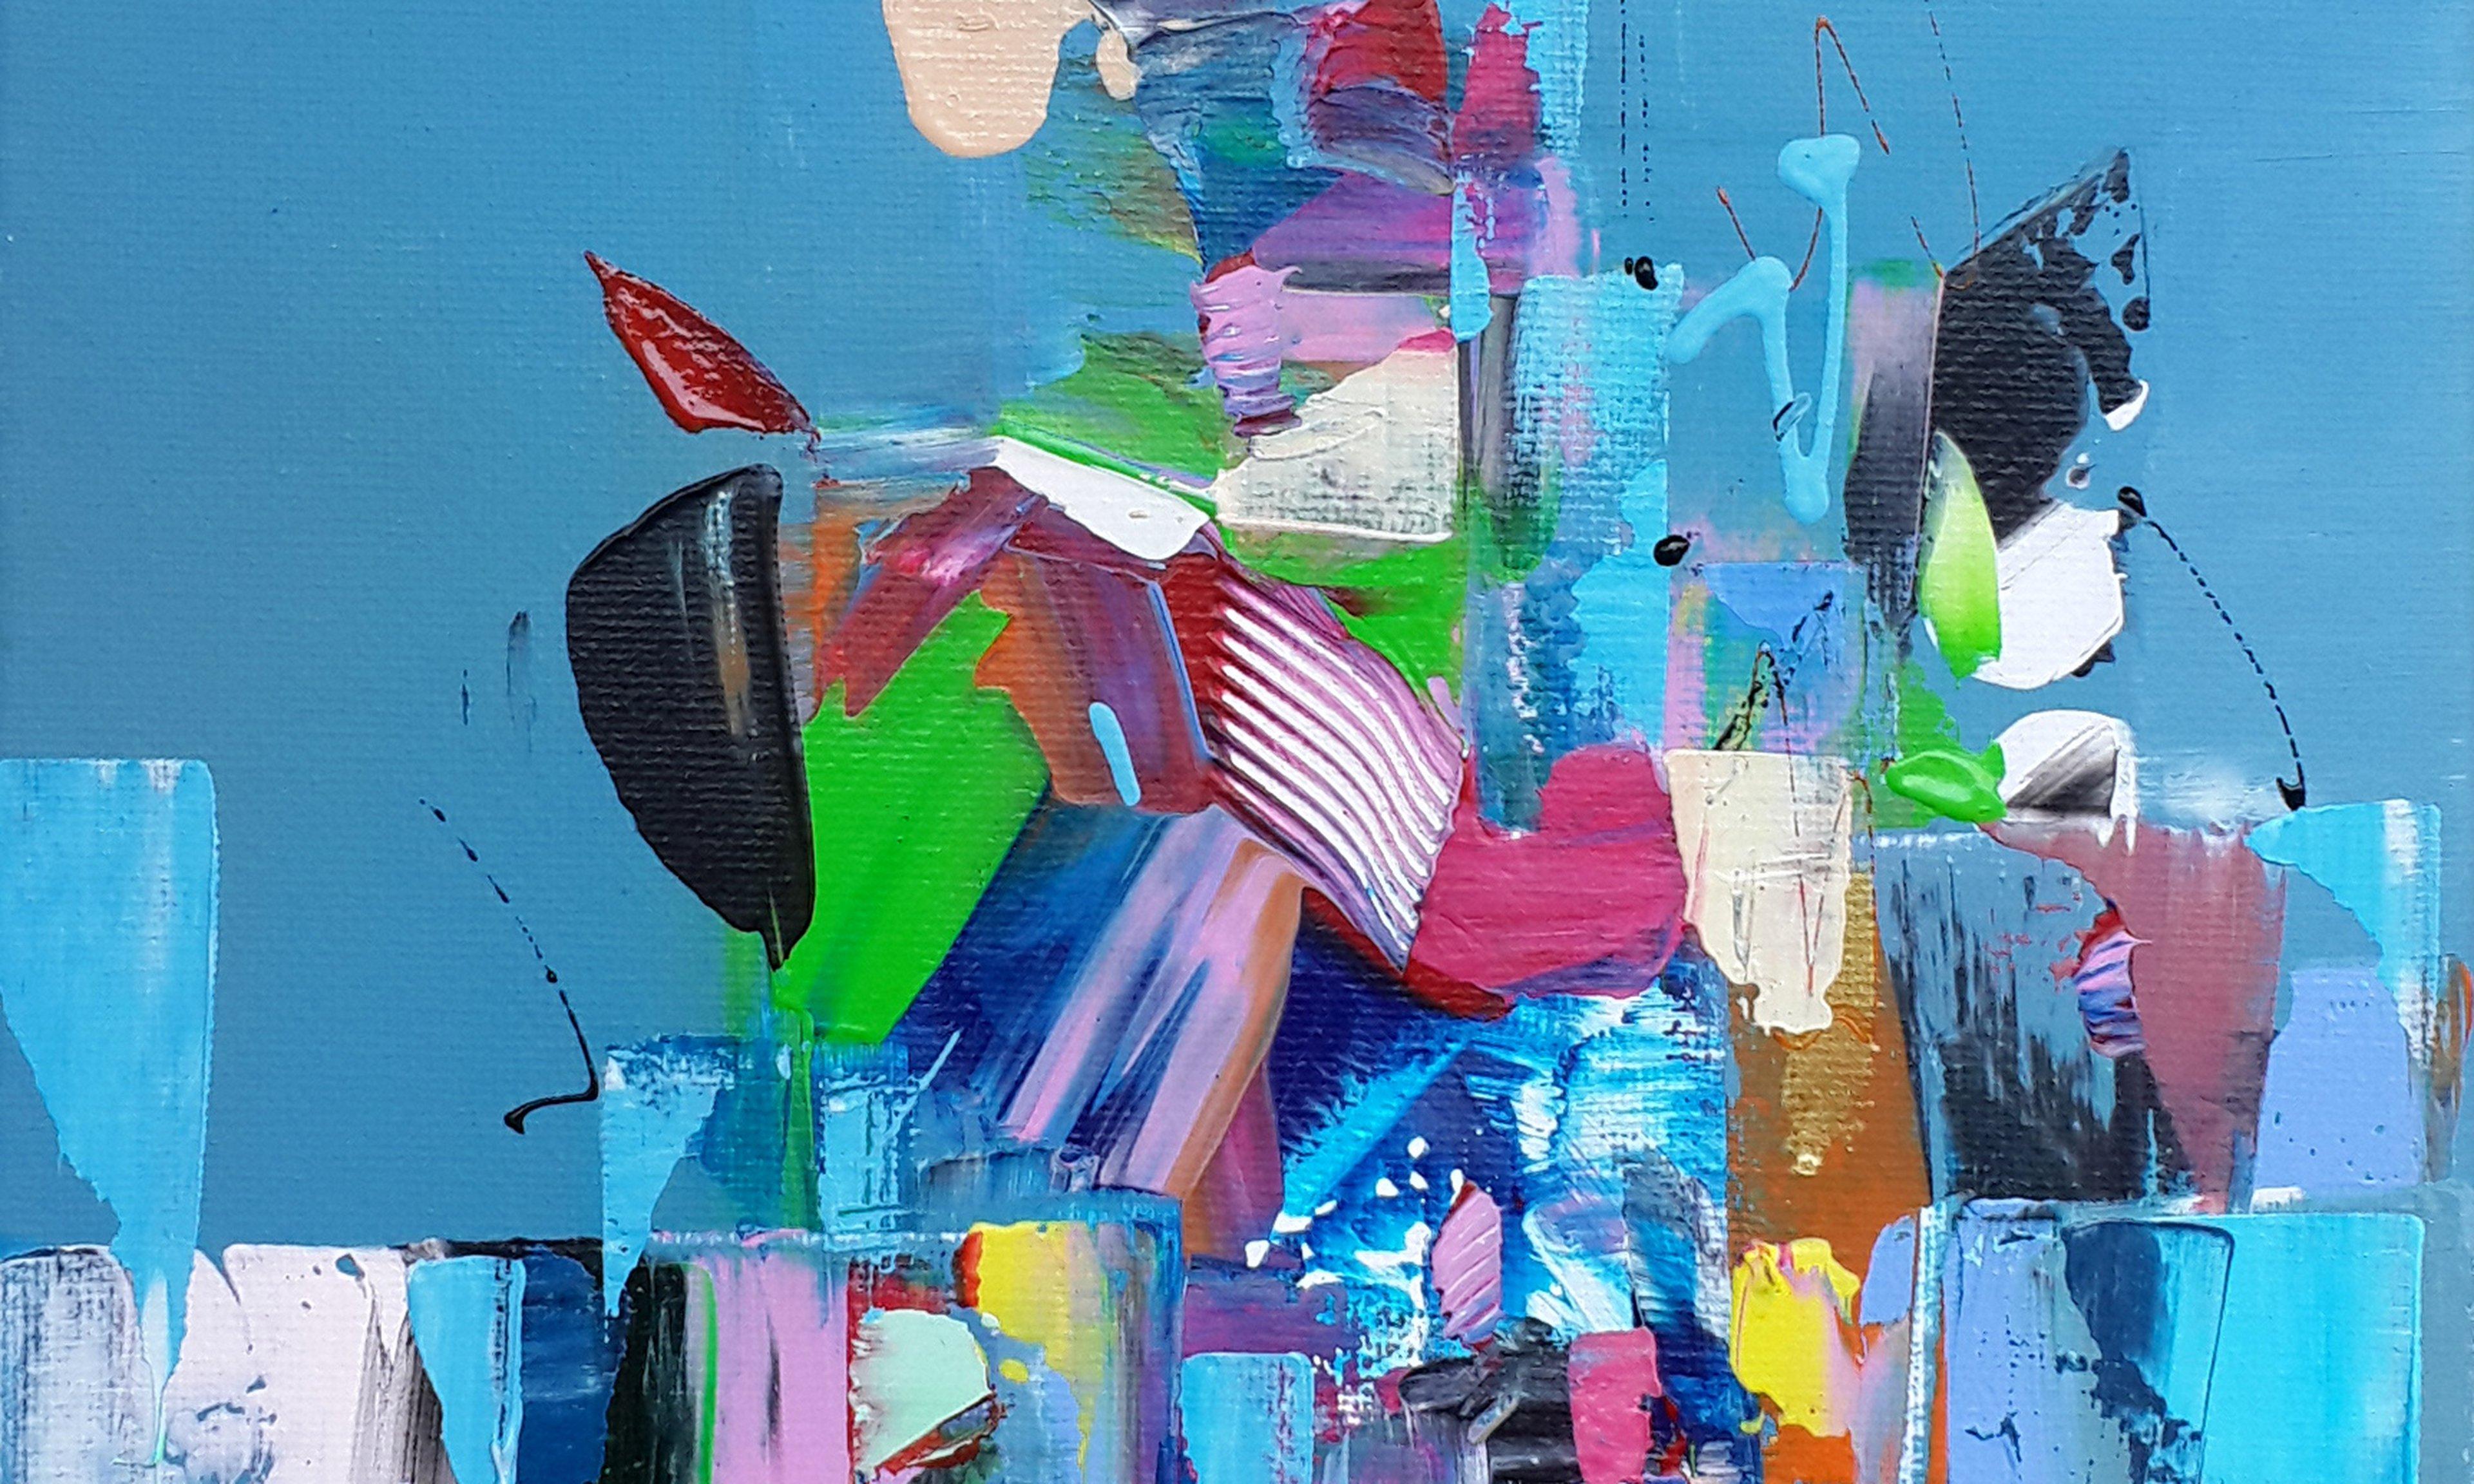 Buy Art Original Artwork Wall Art Art Prints Artfinder